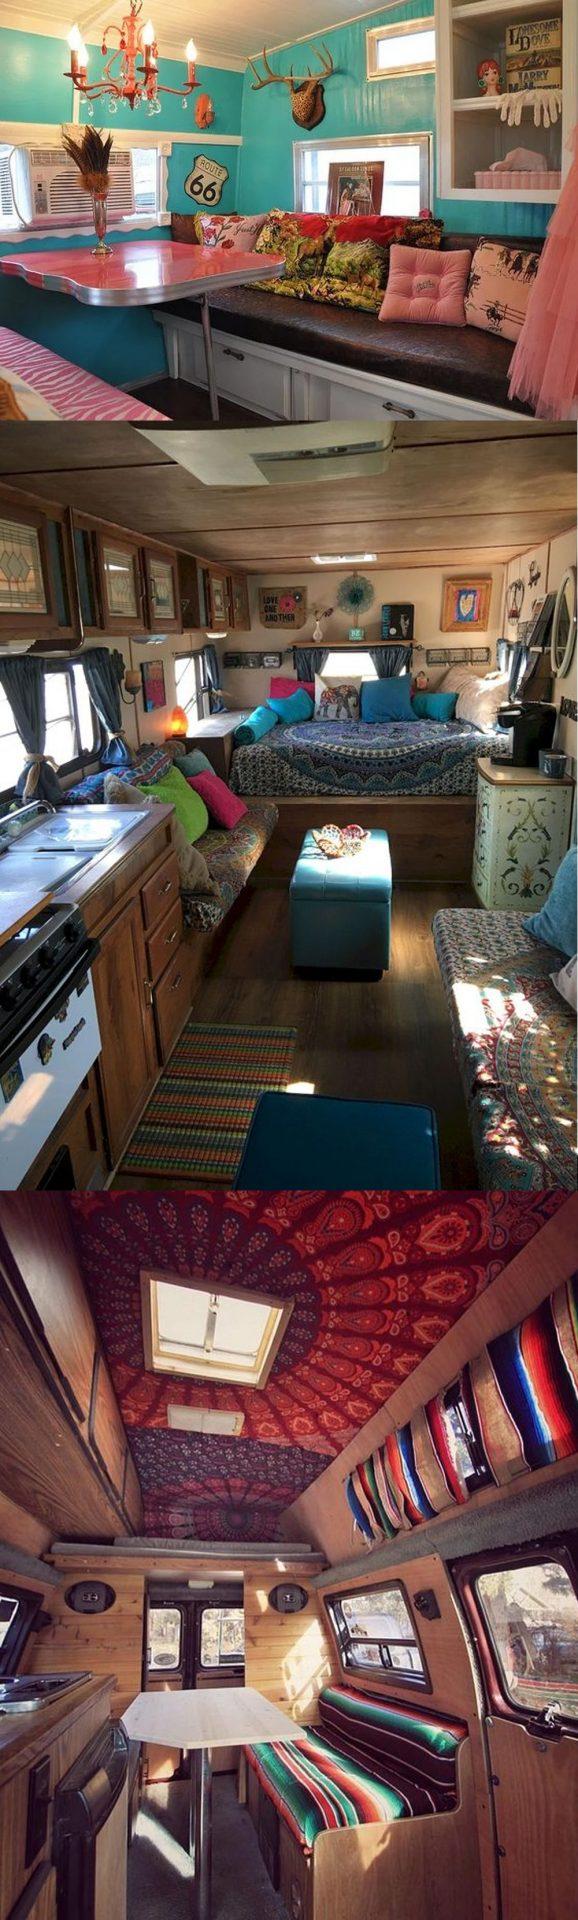 how to repair travel trailer interior walls